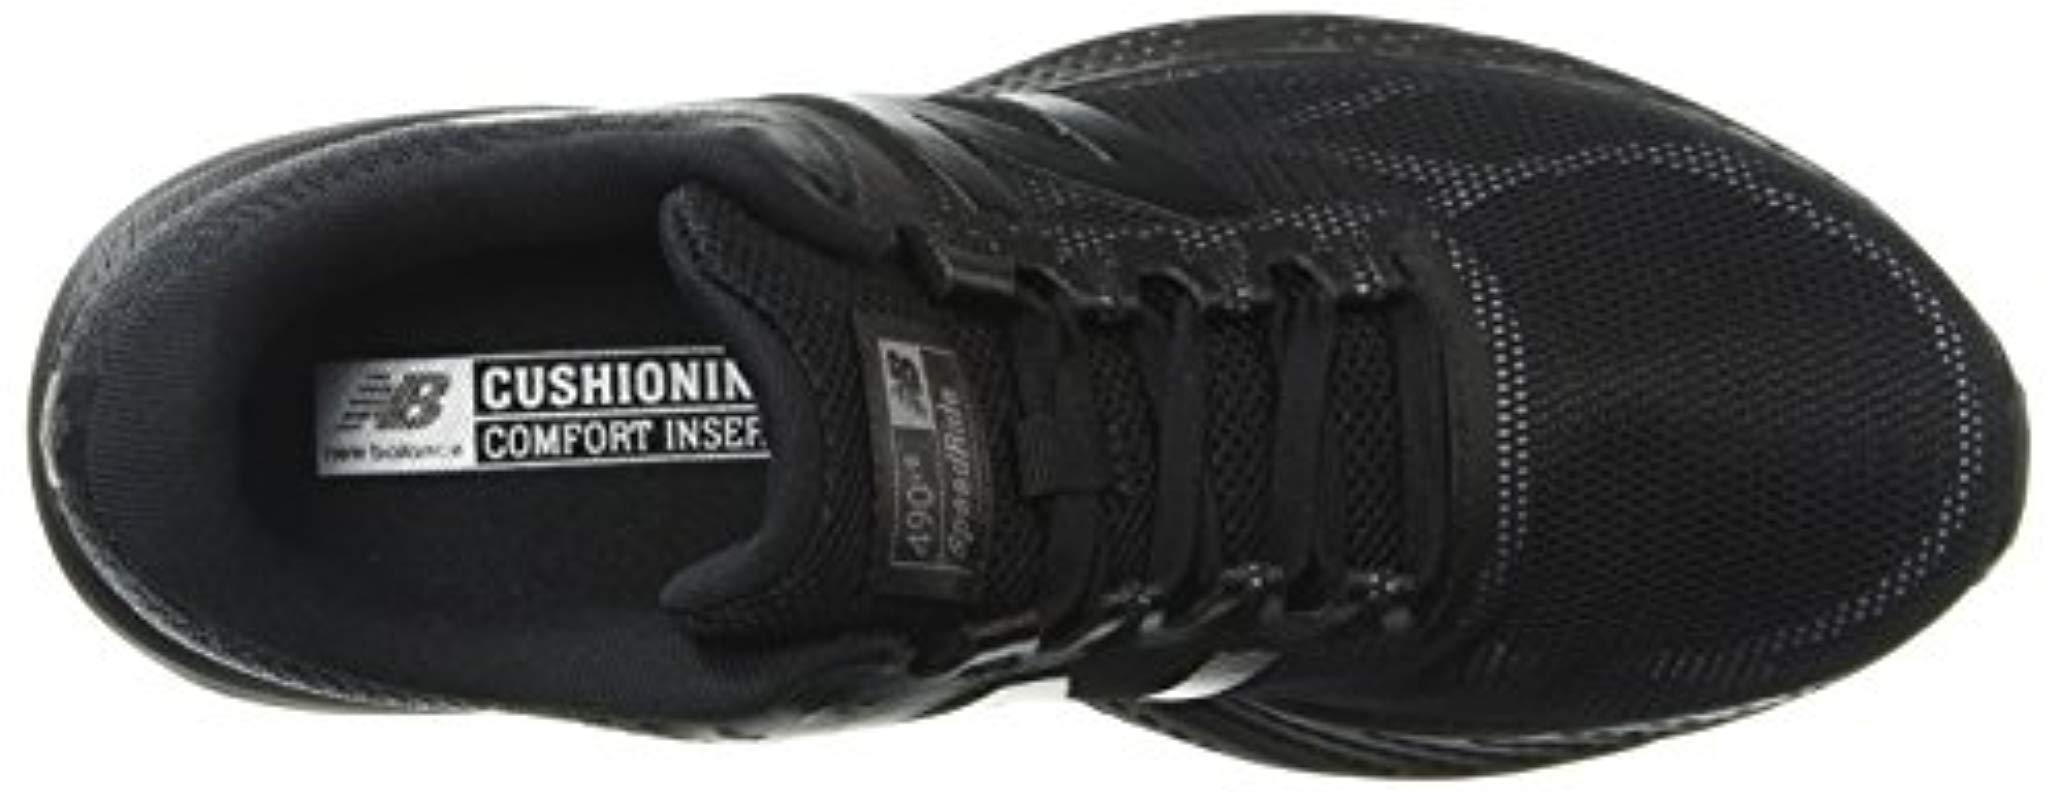 87dc57942559f New Balance 490v6 Cushioning Running Shoe, Black, 5.5 D Us